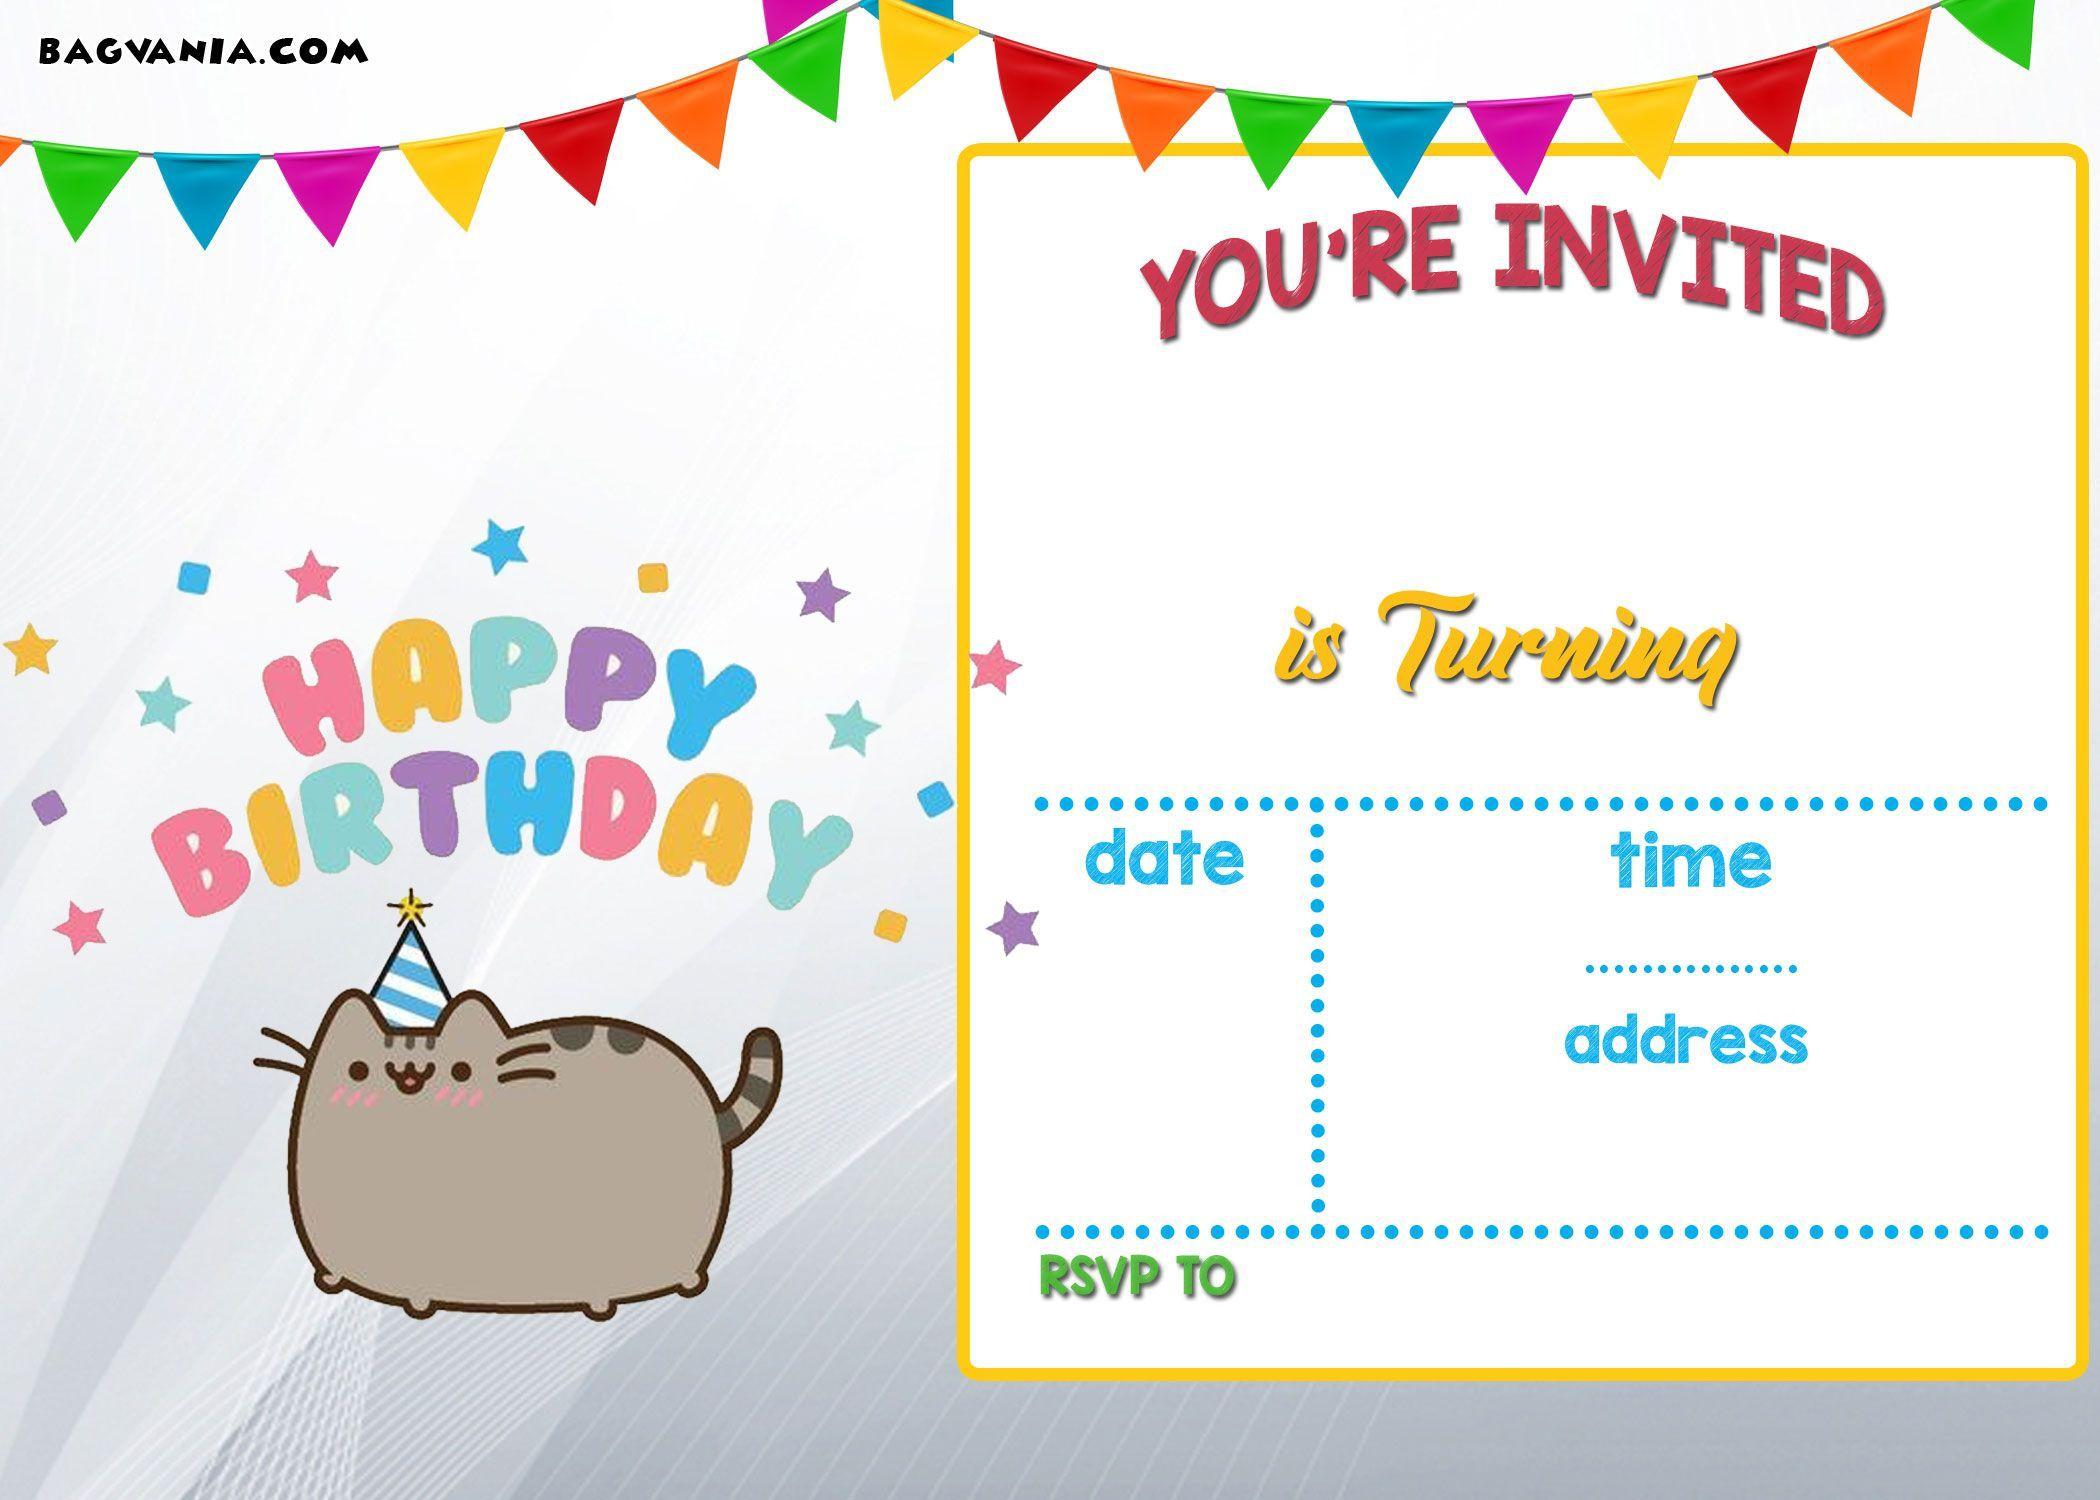 000 Surprising Free Online Invitation Template Printable Image  Baby Shower WeddingFull